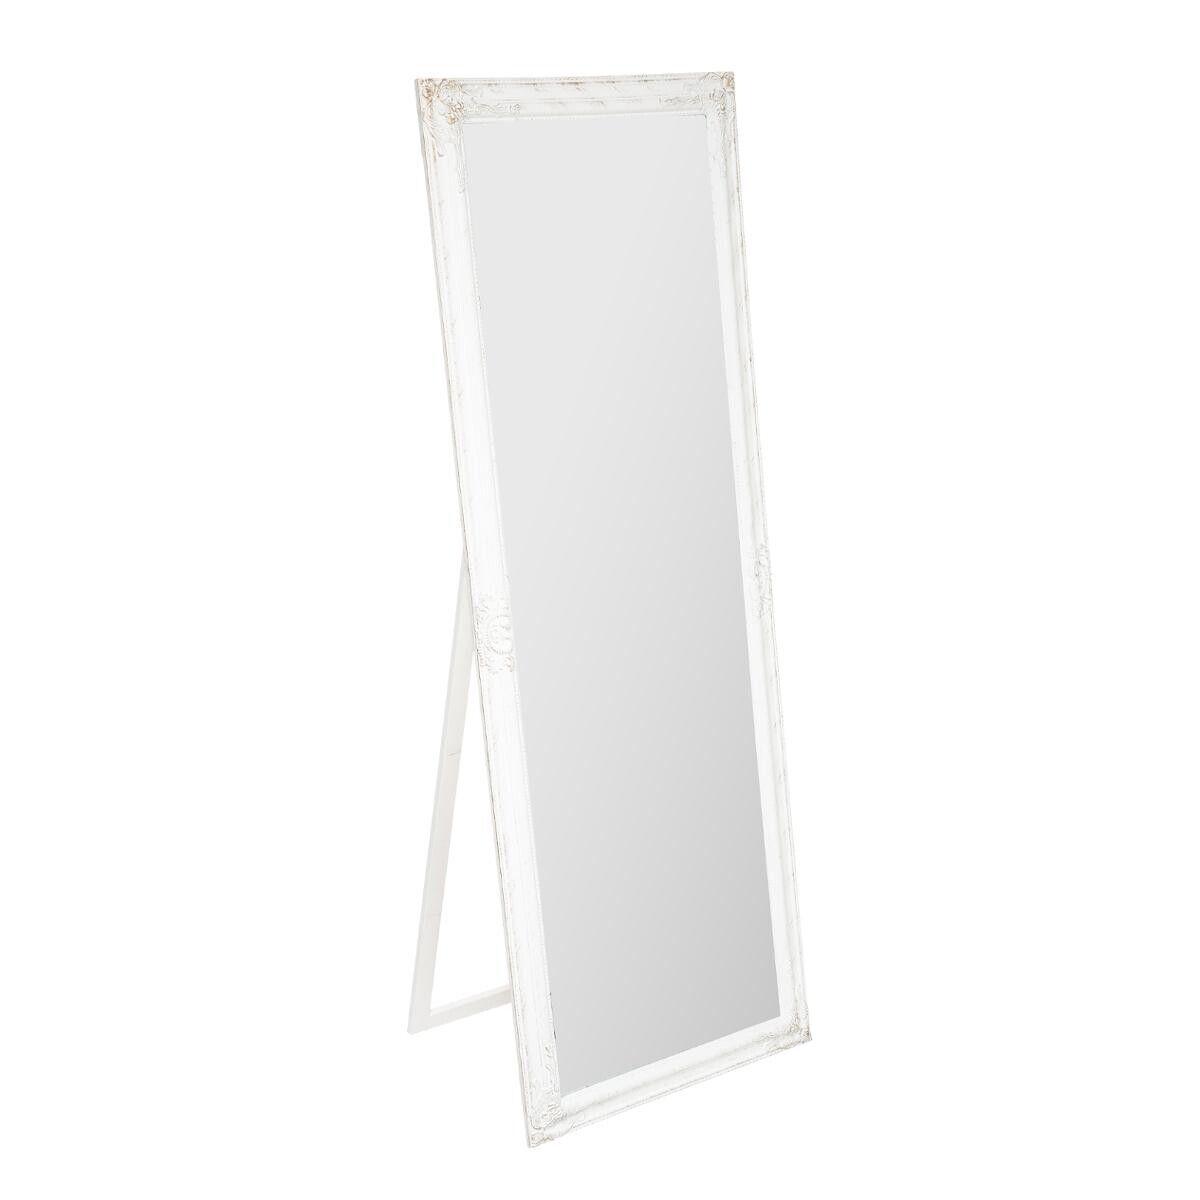 Atmosphera Miroir sur pied, bois, blanc 62x172 cm